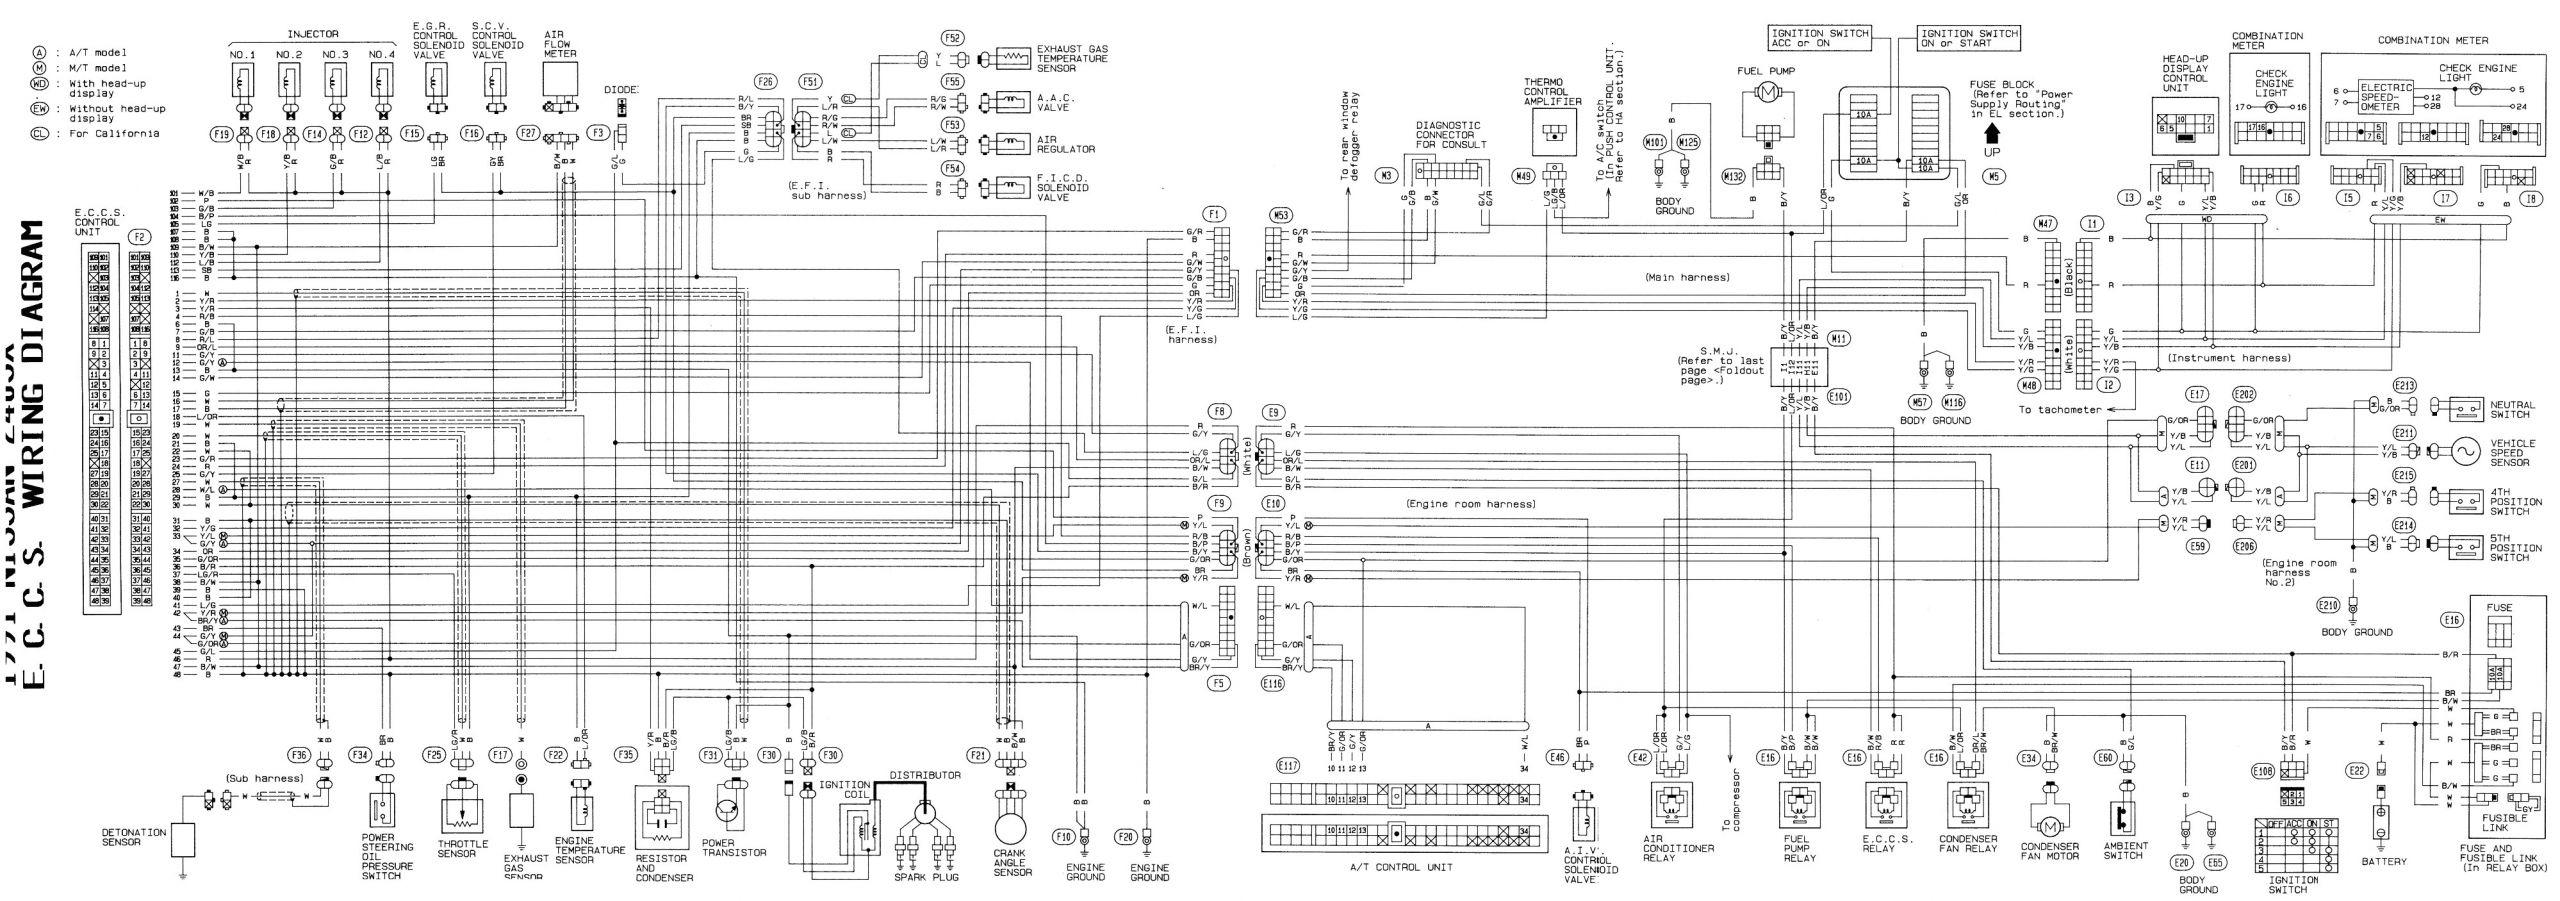 300zx engine harness diagram s14 ka24de wiring harness diagram 1990 nissan 240sx engine wiring of 300zx engine harness diagram png